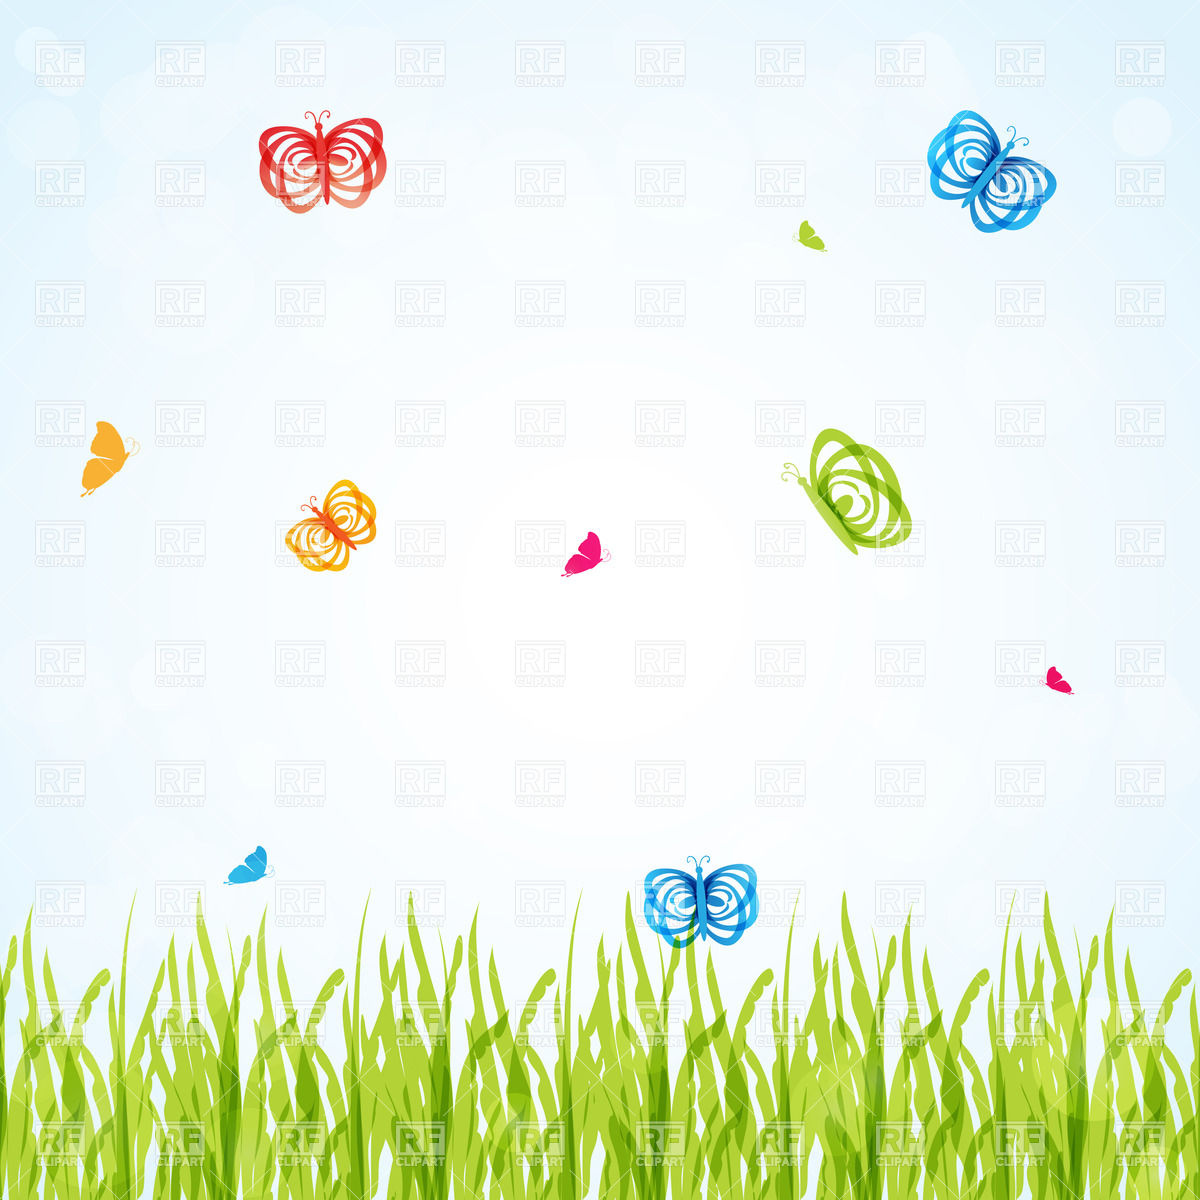 Butterfly meadow clipart.